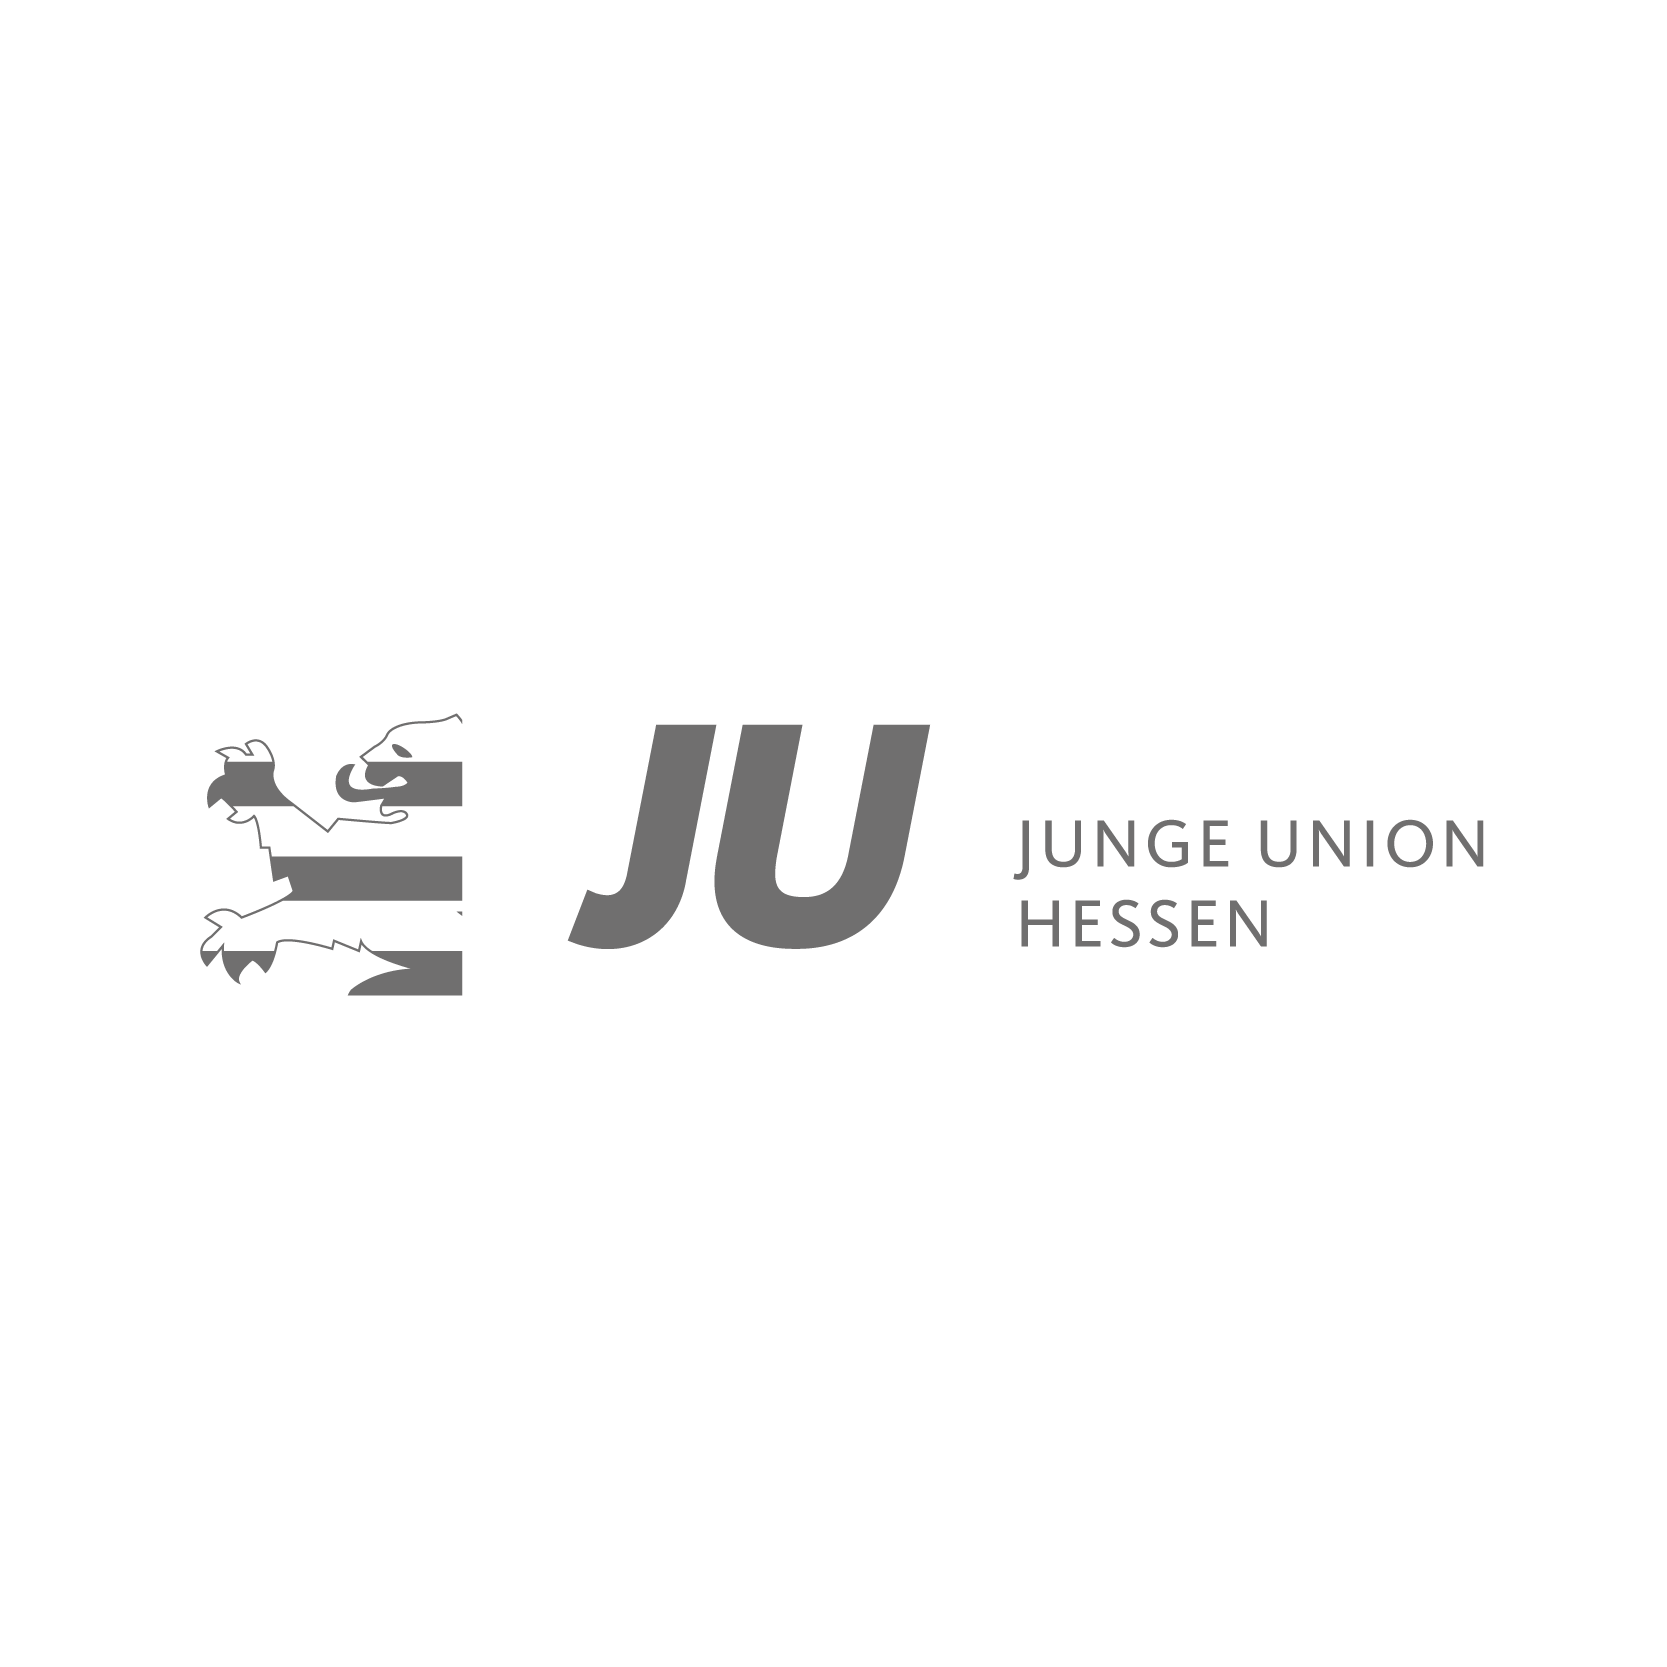 Junge Union Hessen